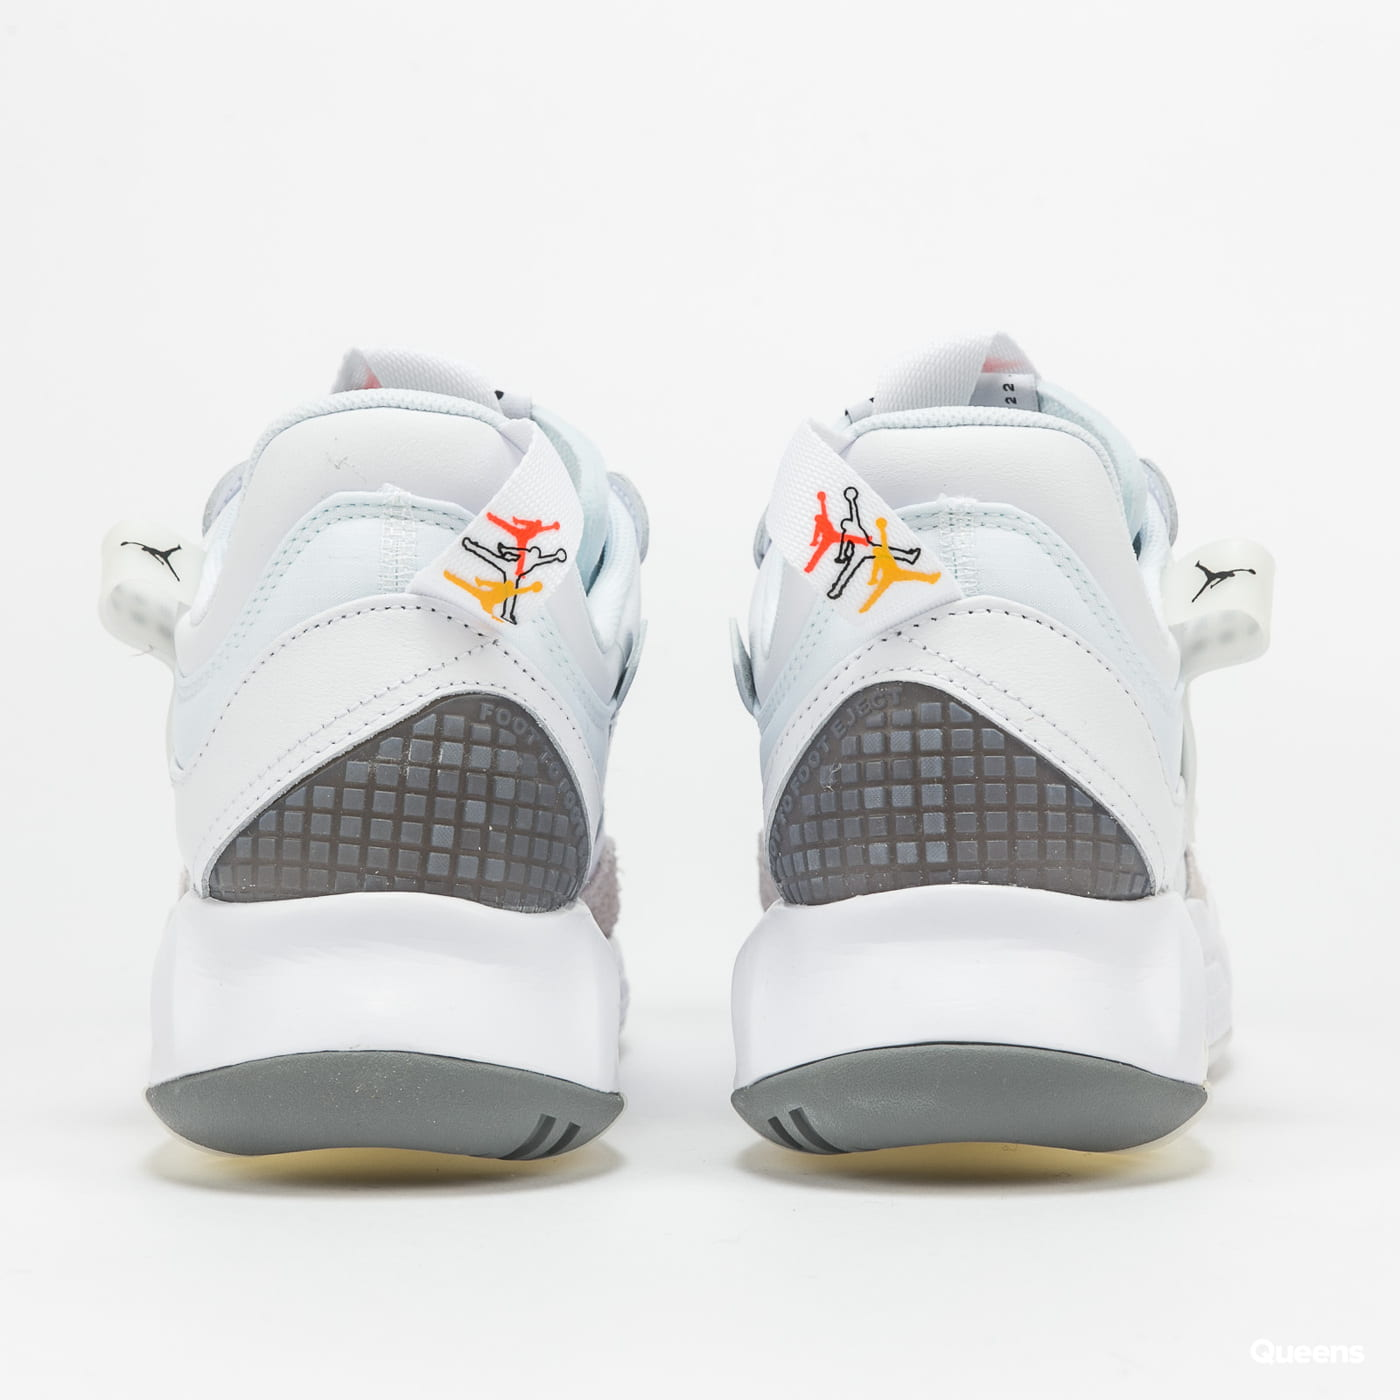 Jordan MA2 white / black - team orange